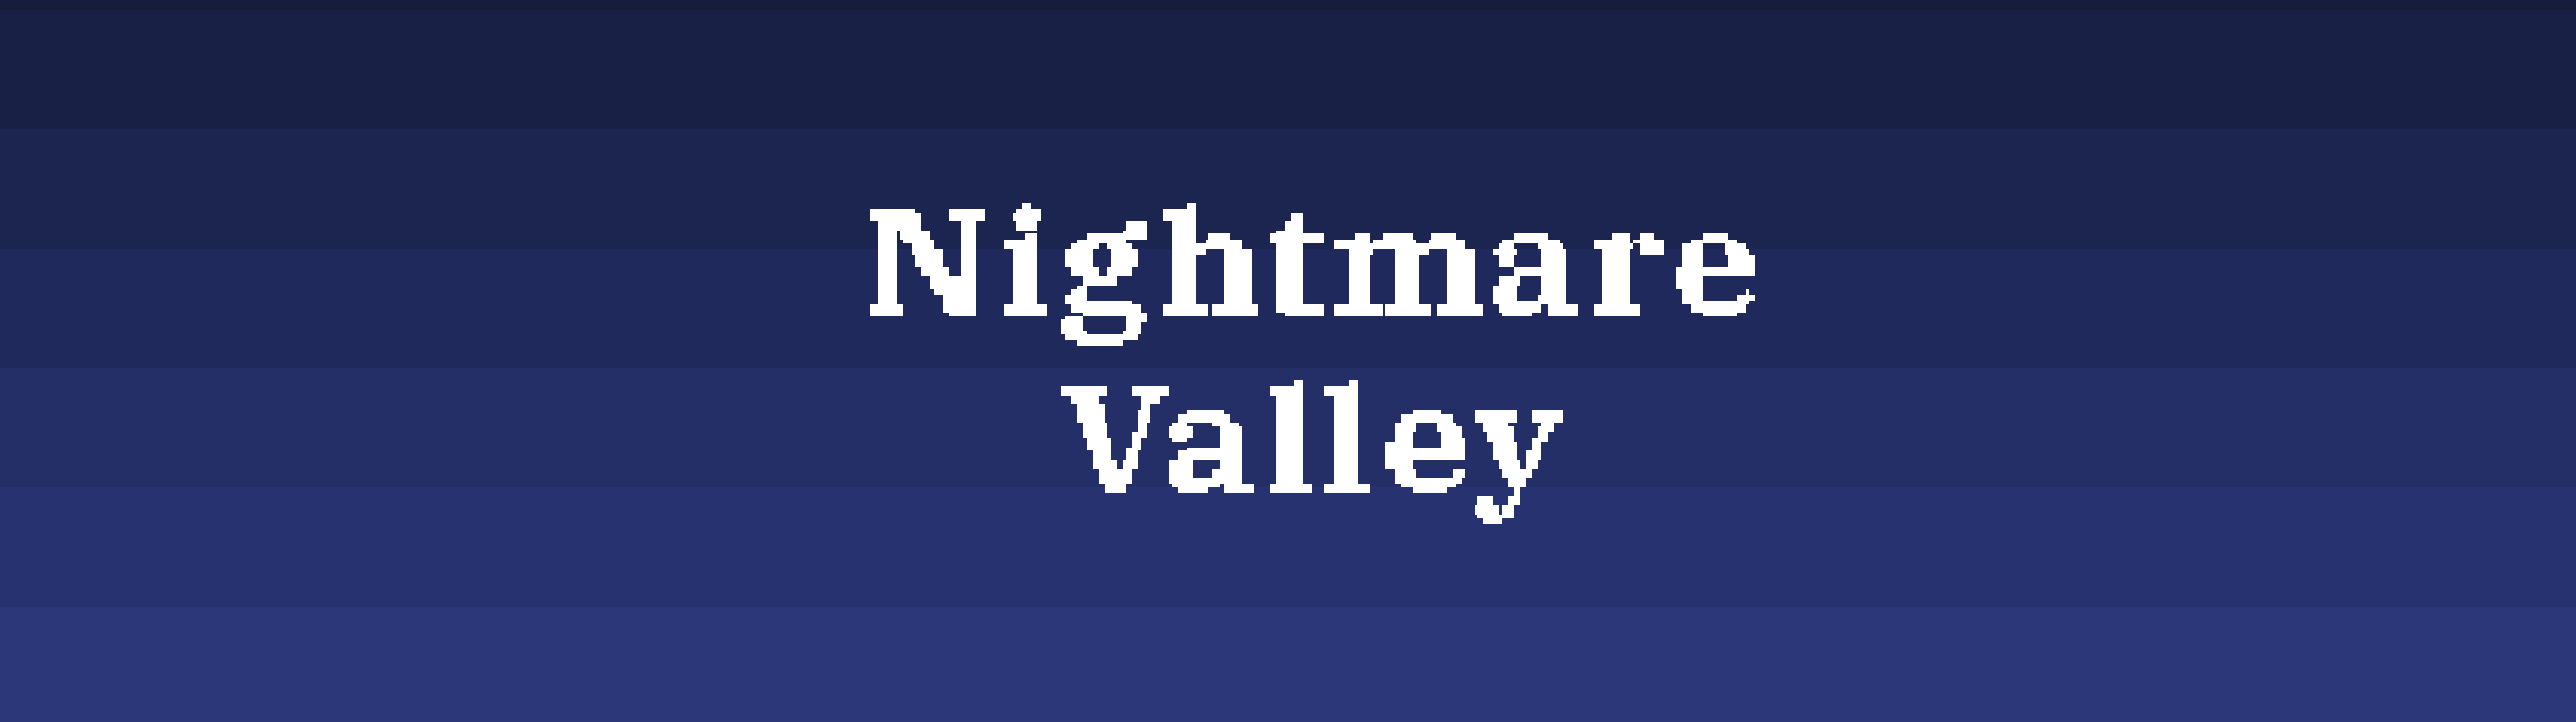 Nightmare Valley